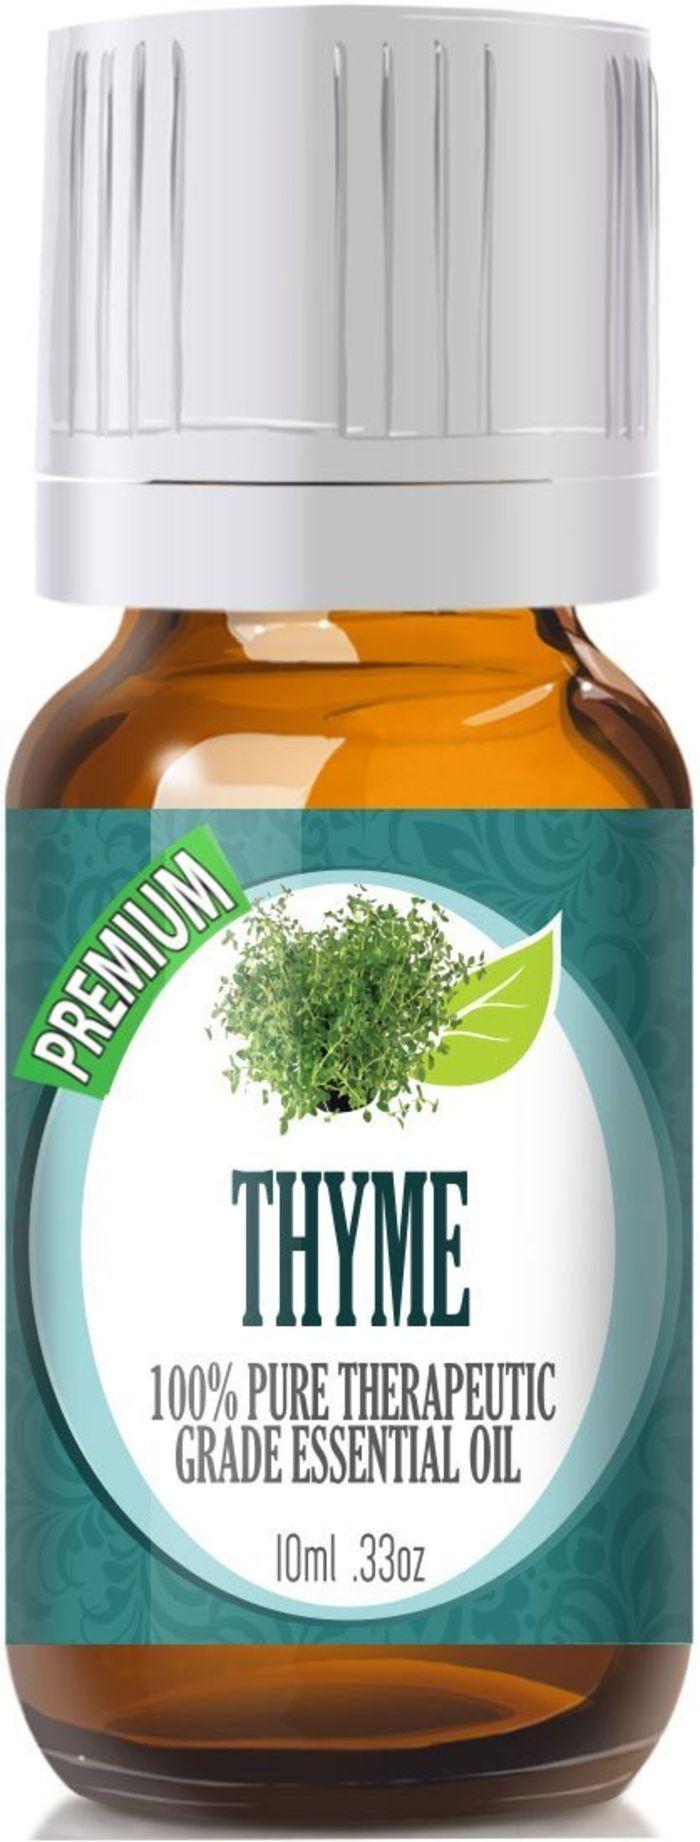 Natural Living Essential Oils Health Benefits Myth